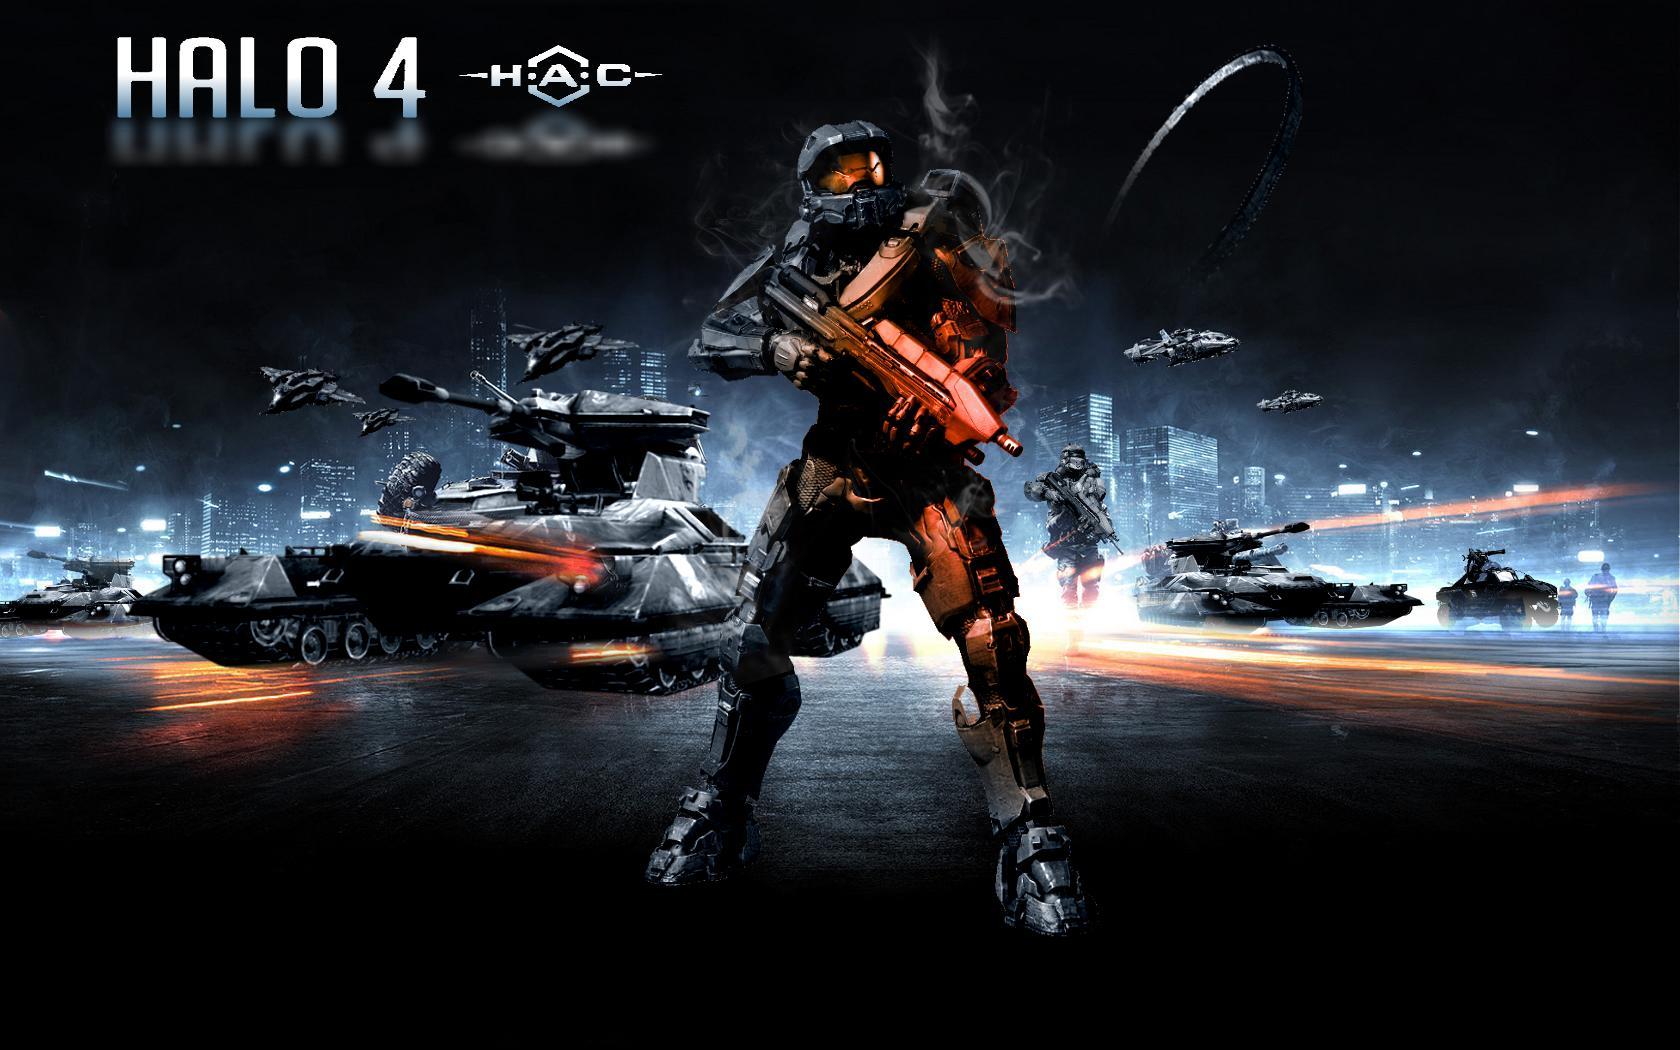 Halo Wallpaper Hd Wallpapers in Games Imagesci com 1680x1050